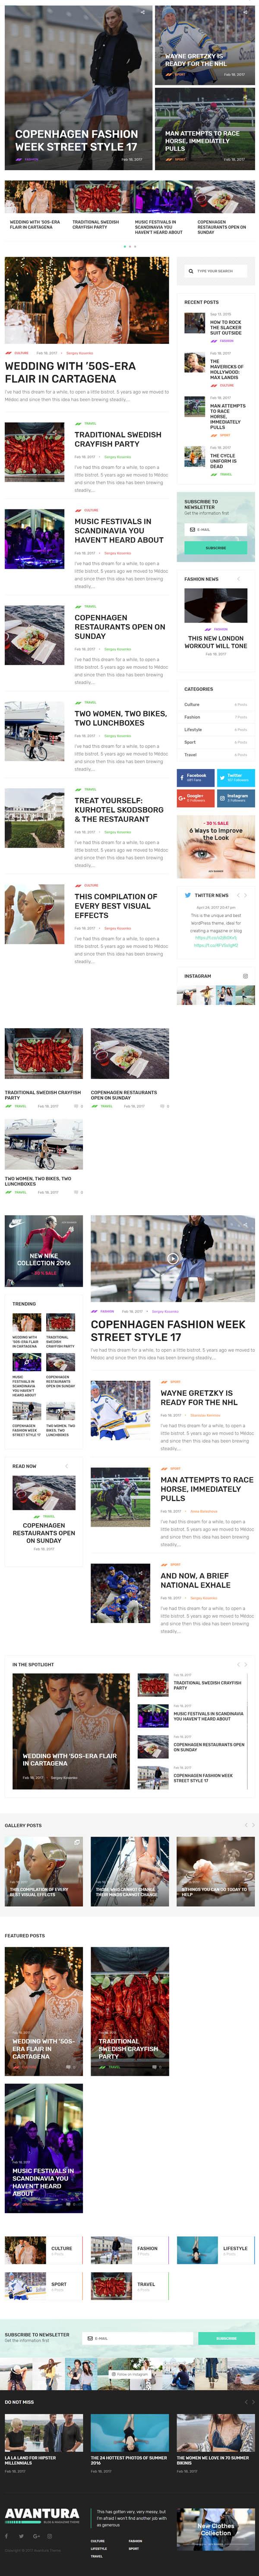 Avantura – Magazine & Blog WordPress Theme